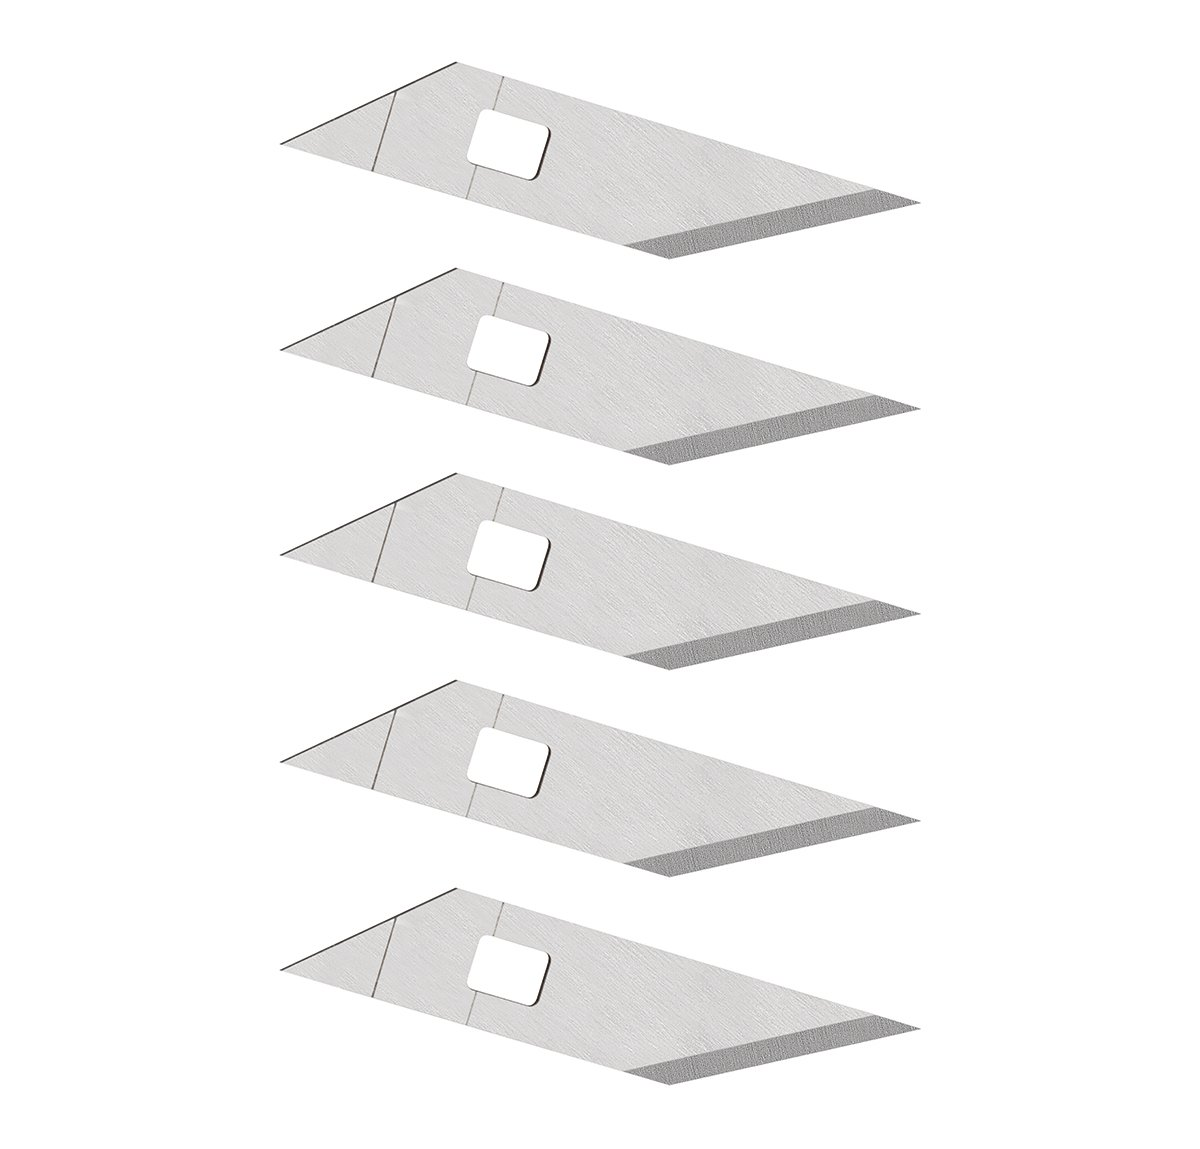 Wedo 7873 73 Set of 5 Spare Blades for Comfortline 78 730 Craft Tool